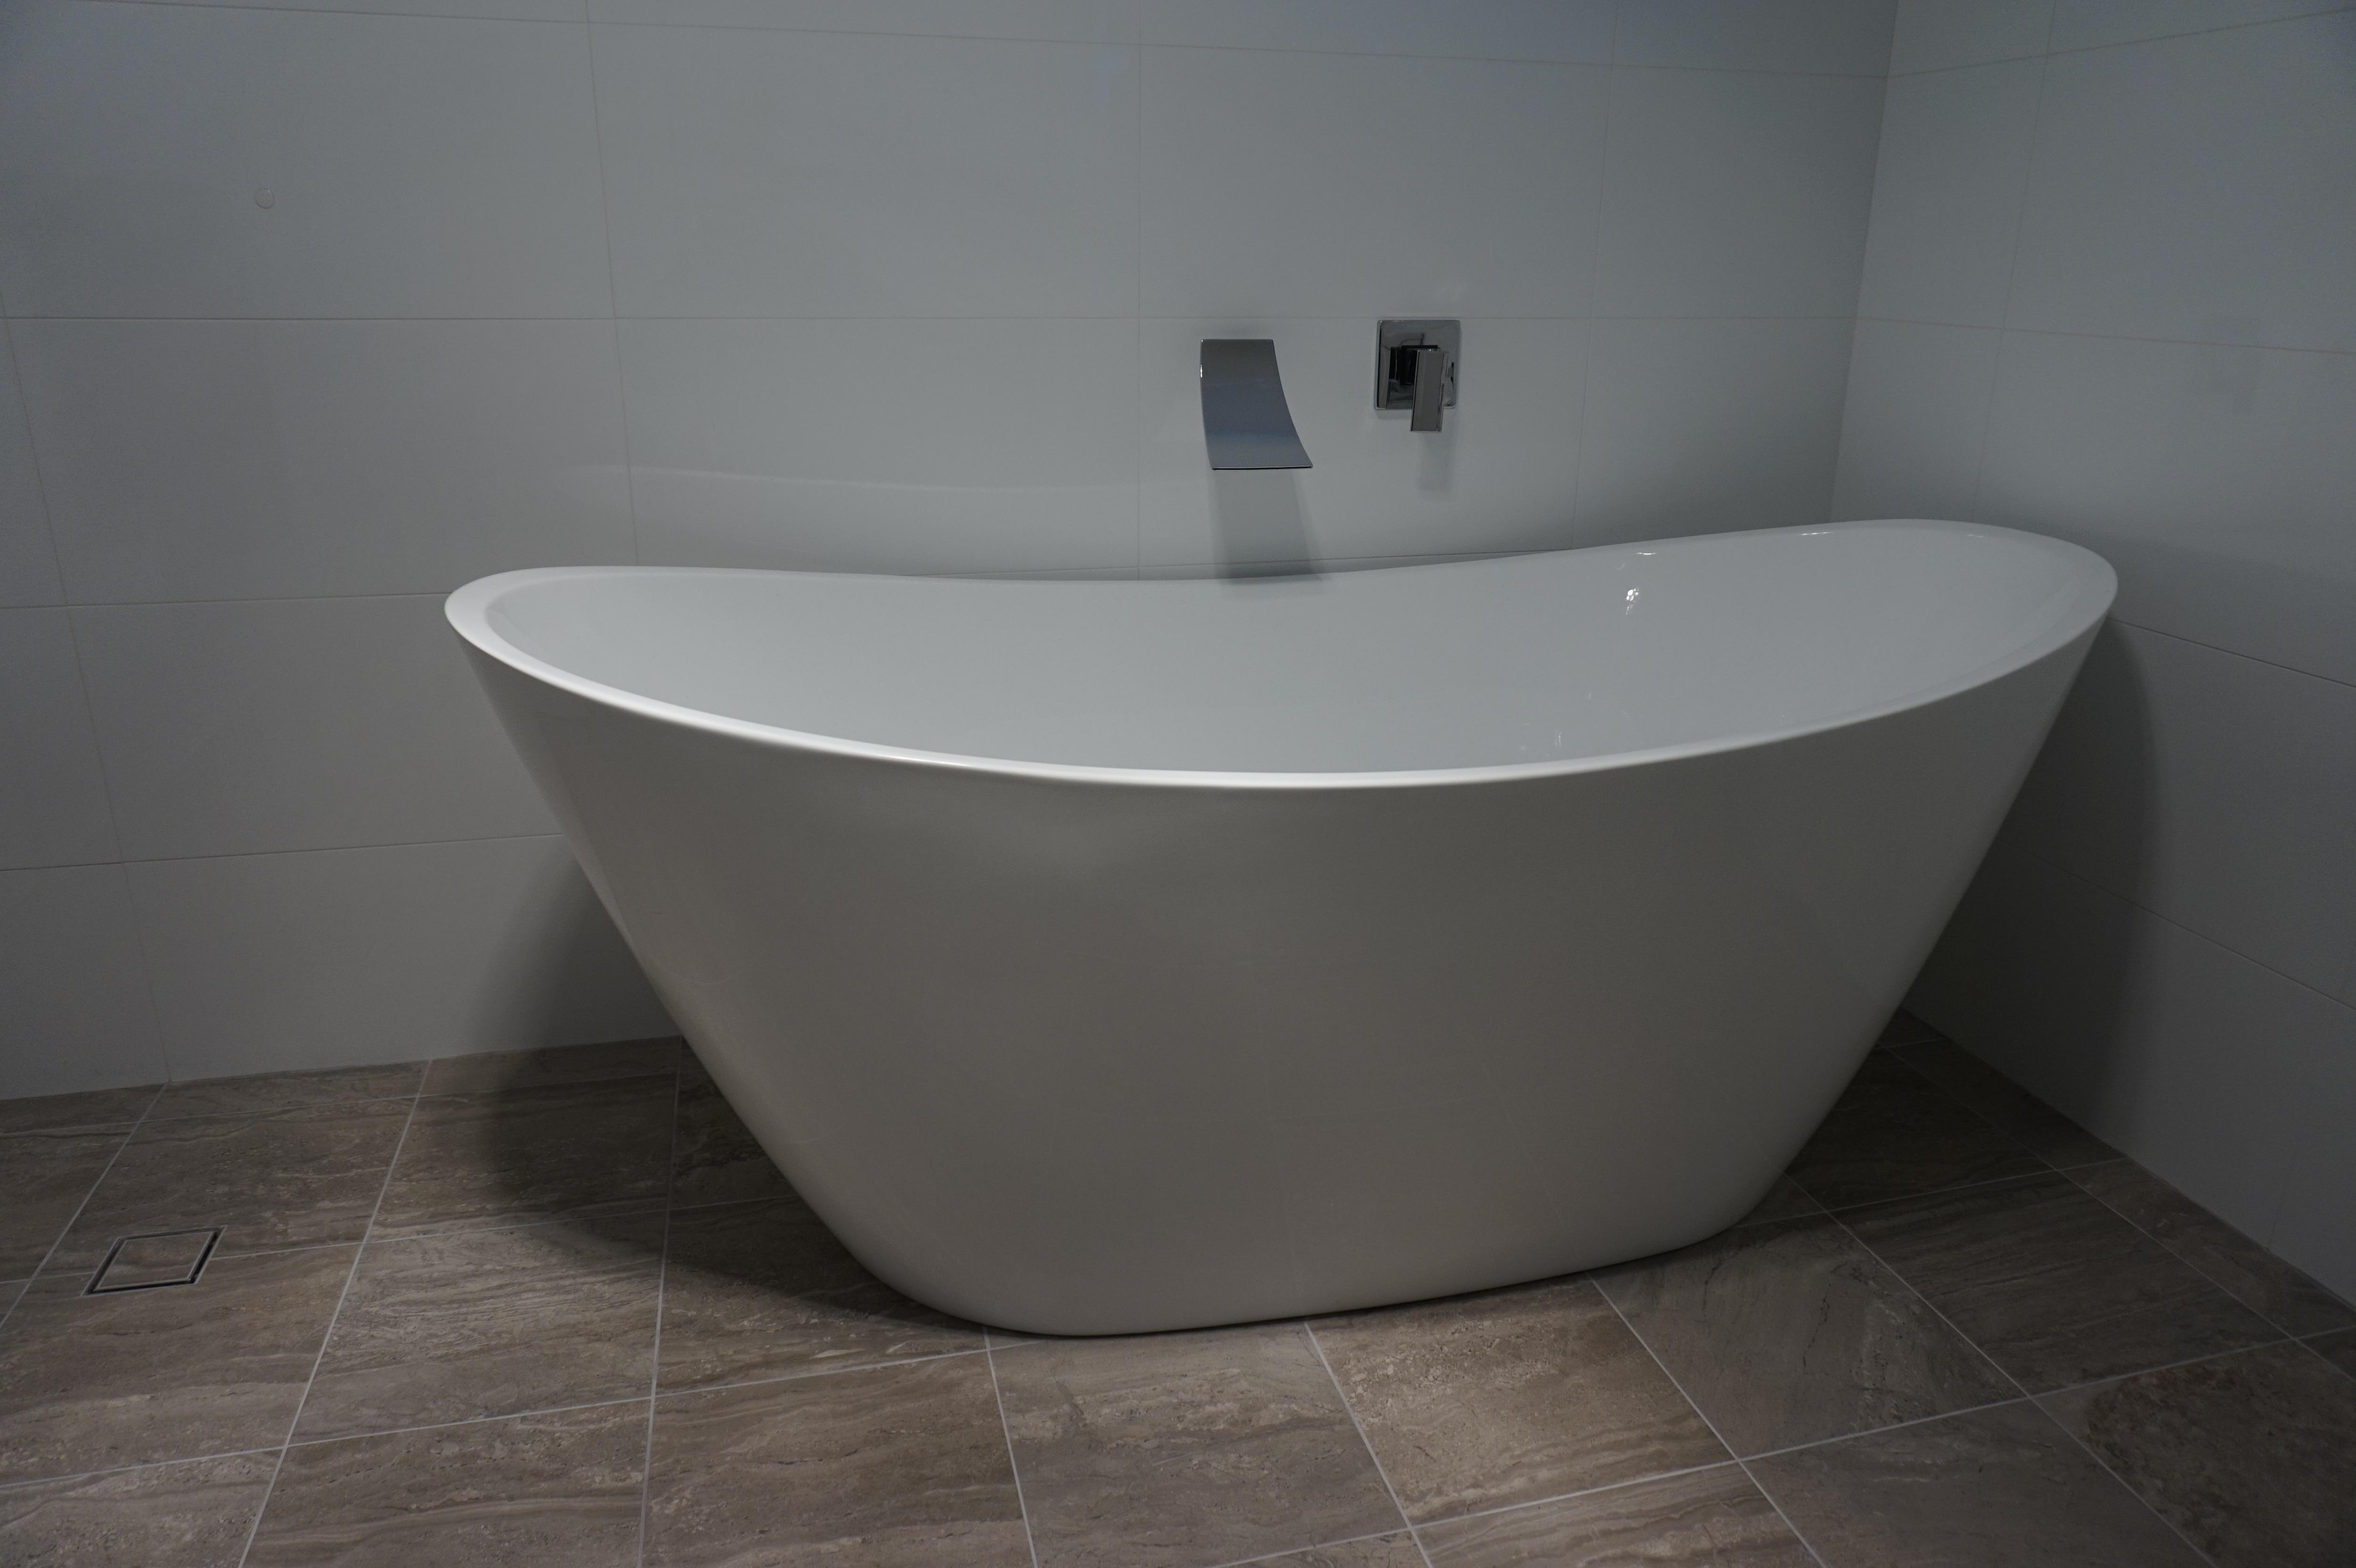 Bathroom Tiles Joondalup clayton's top notch tiling - wall & floor tilers - joondalup